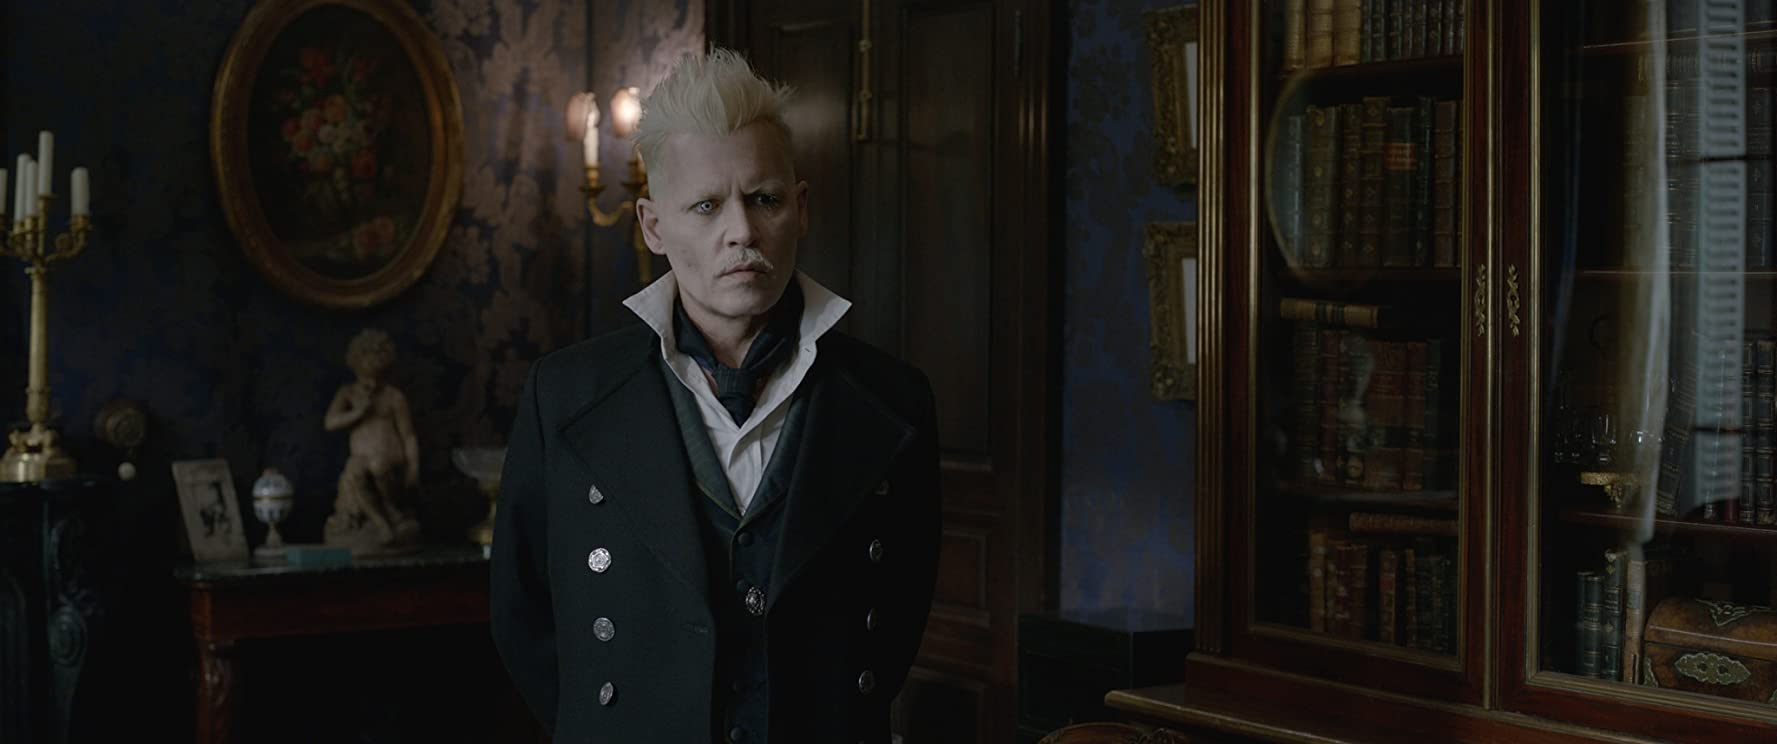 Johnny Depp in Fantastic Beasts: The Crimes of Grindelwald (2018)